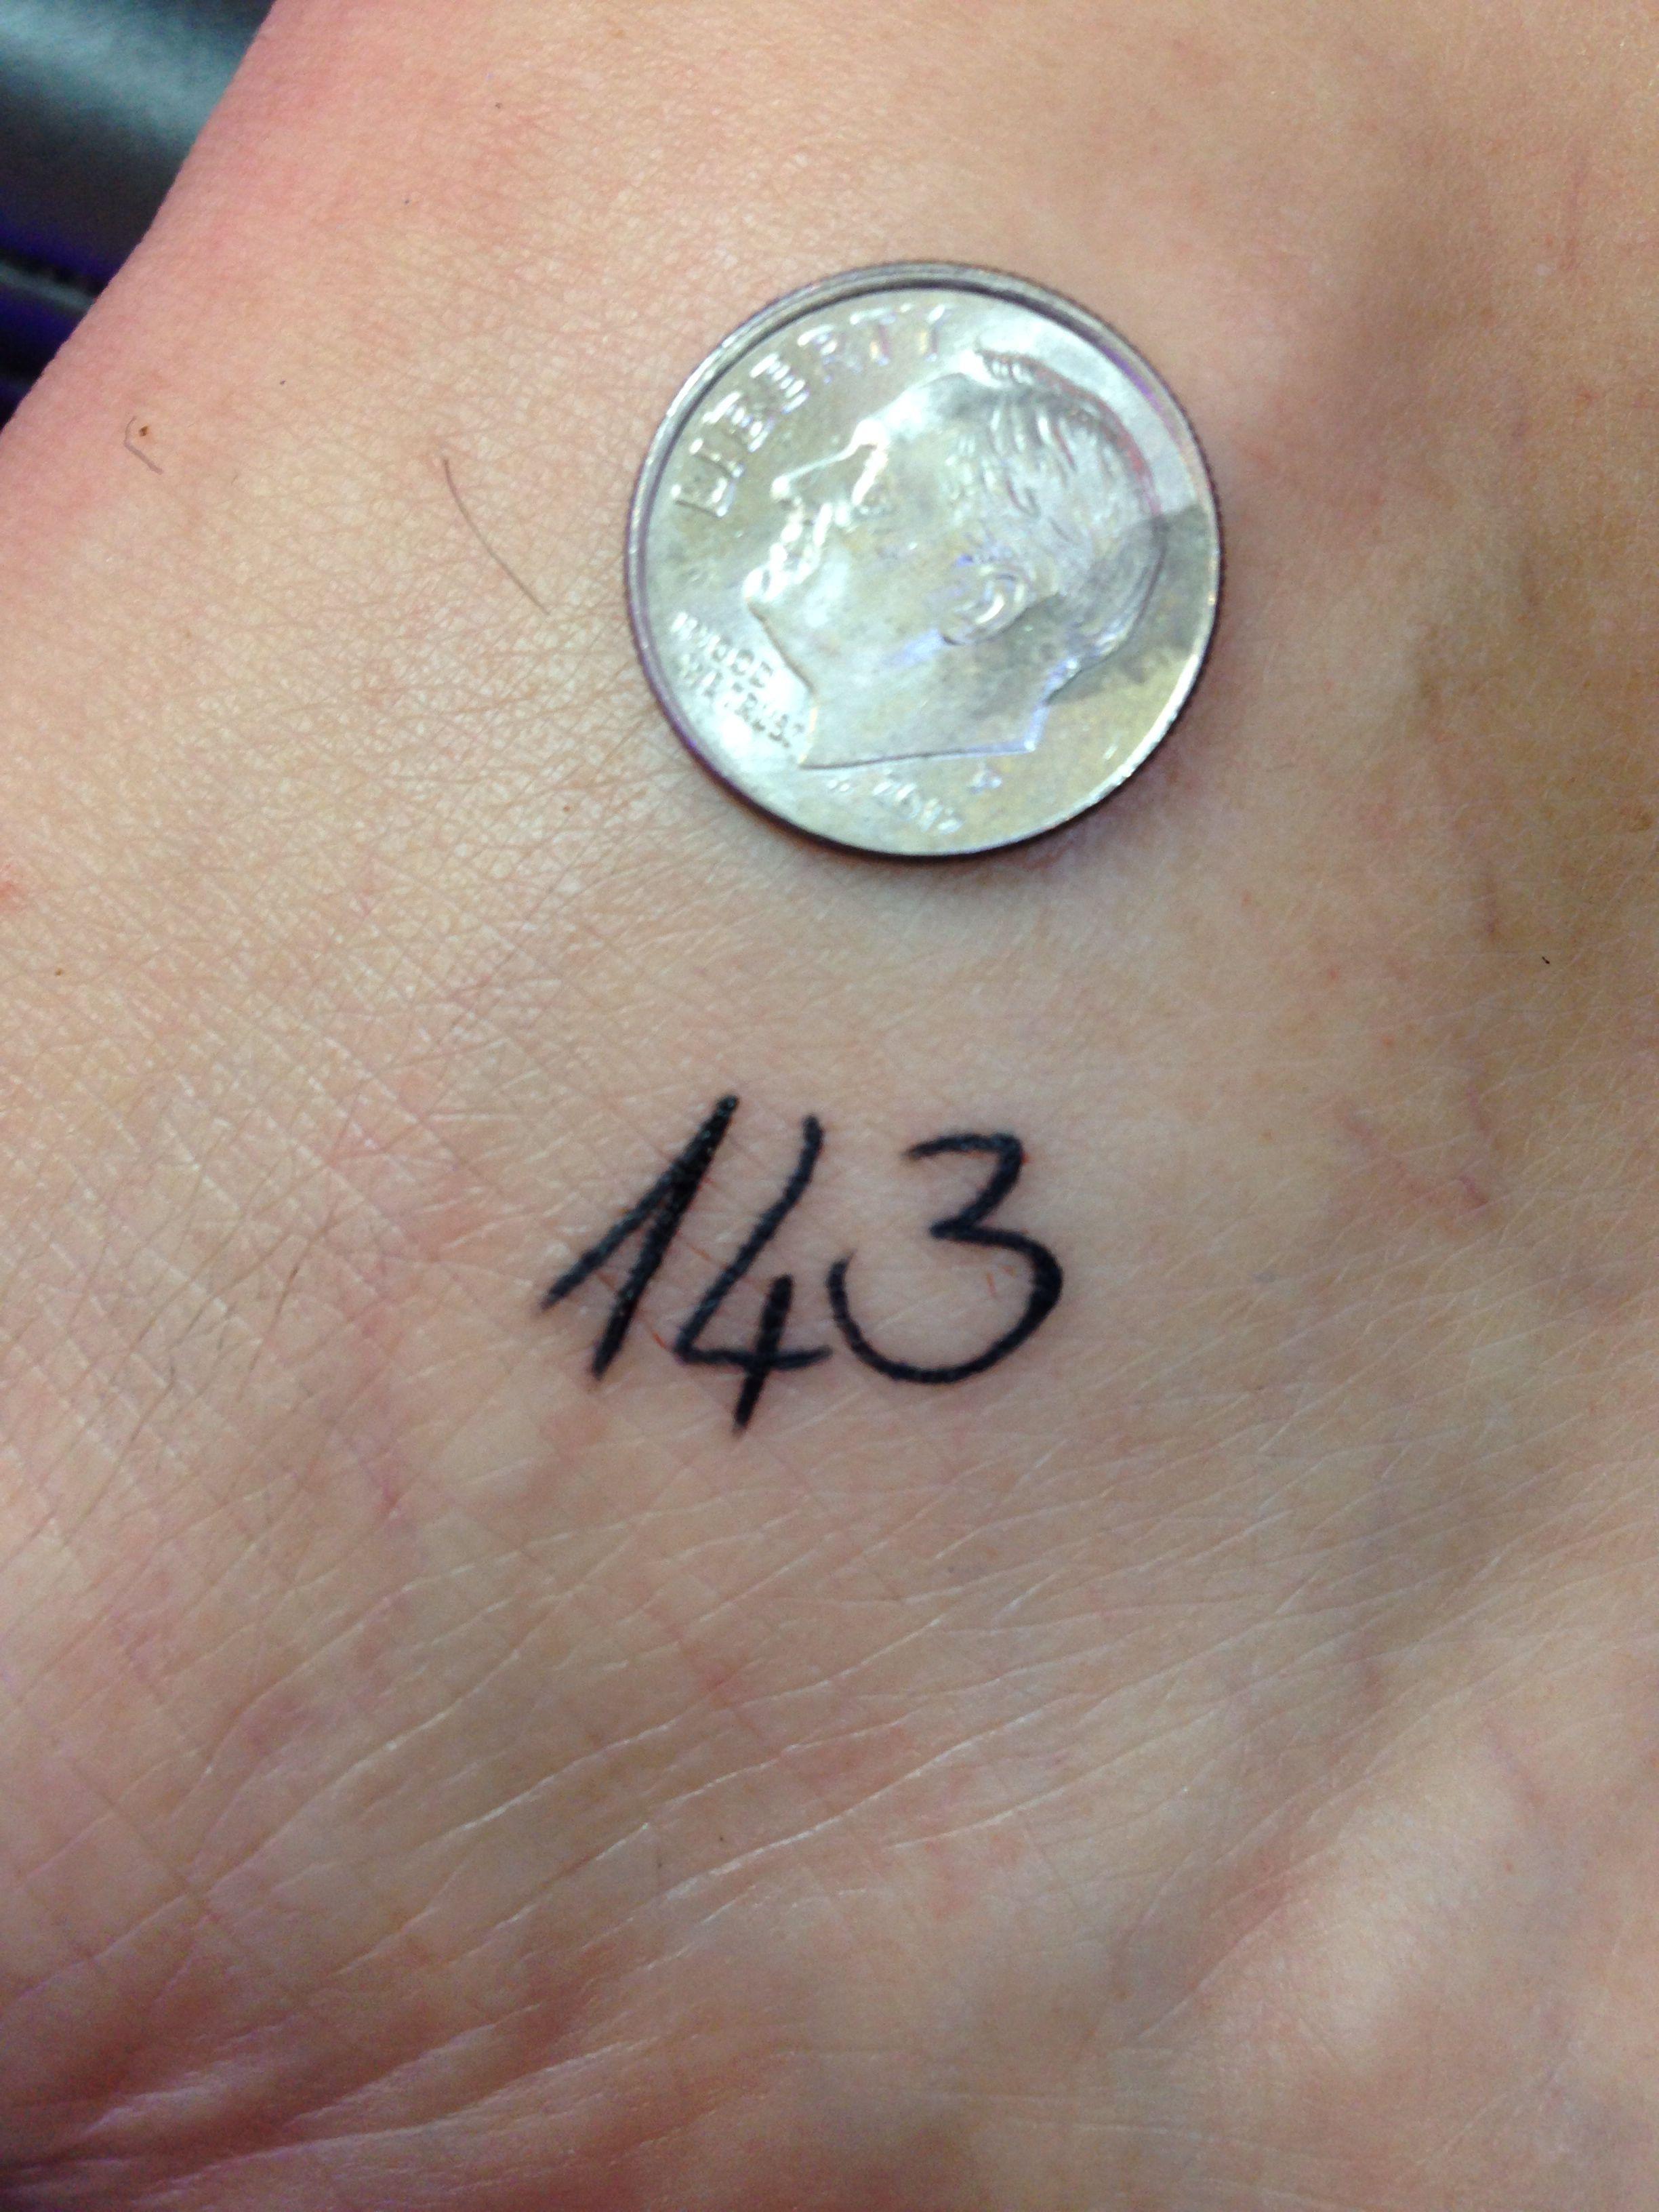 Smaller Than A Dime 143 Love Couple Tattoos Tattoo For Son Bts Tattoos